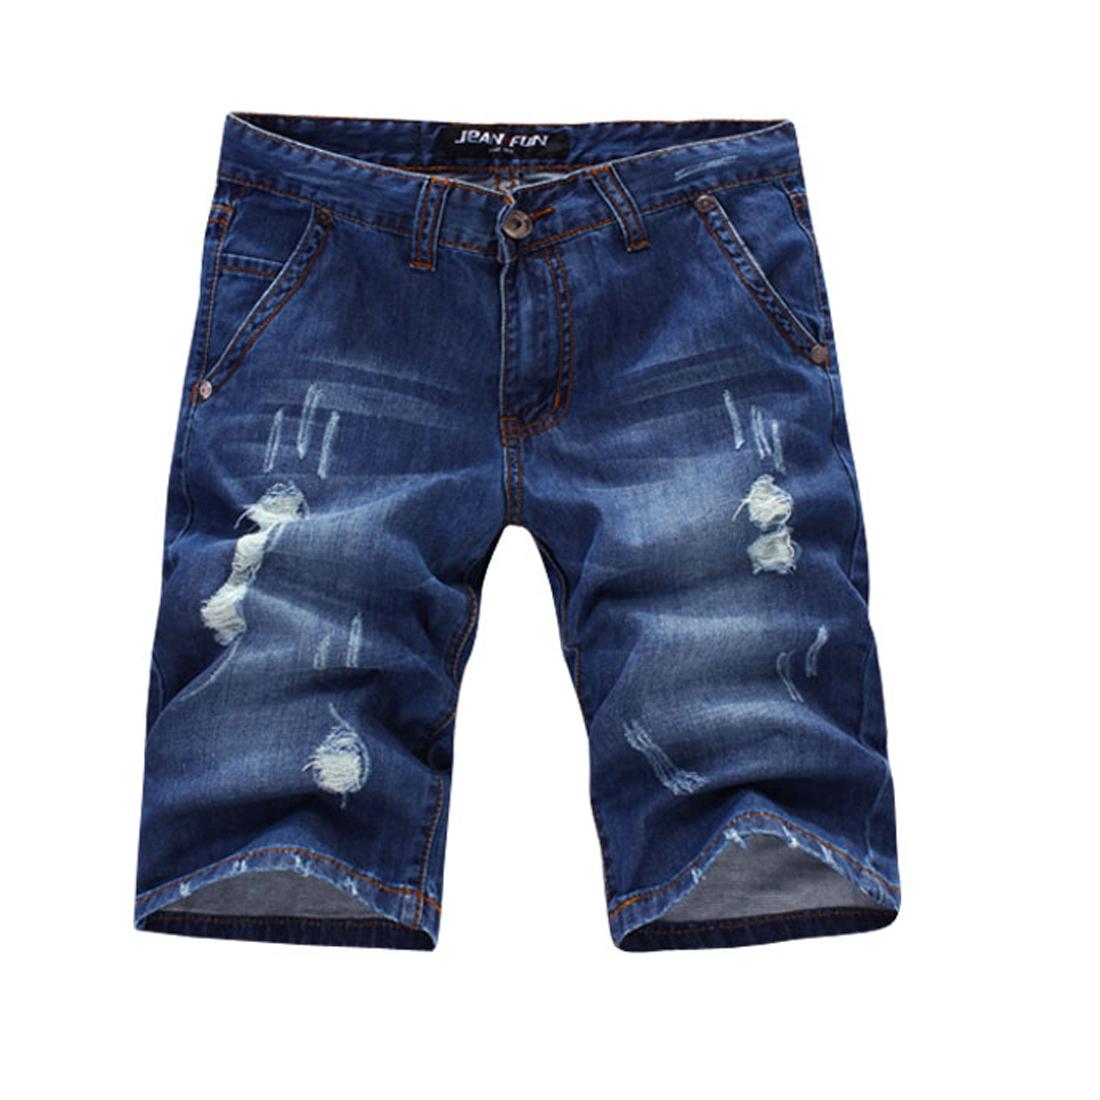 Men Hidden Zipper Button Closure Slant Pocket Belt Loops Jeans Blue W35